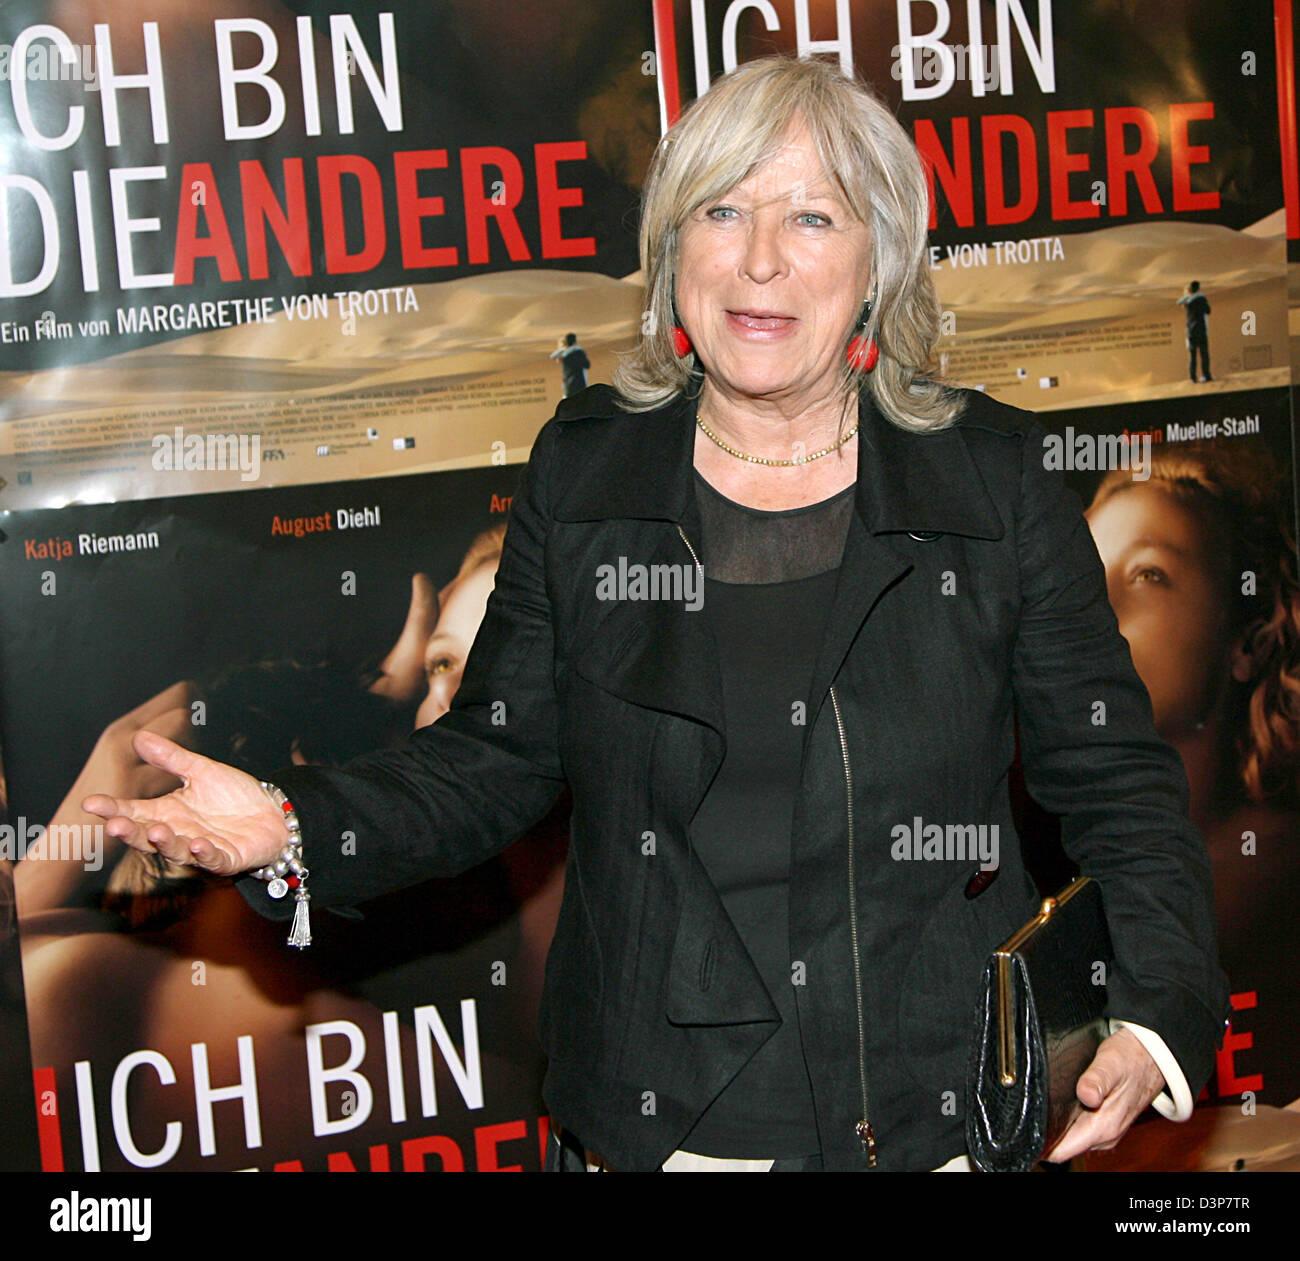 German director Margarethe von Trotta appears for the film premiere 'Ich bin die Andere' in Munich, Germany, - Stock Image